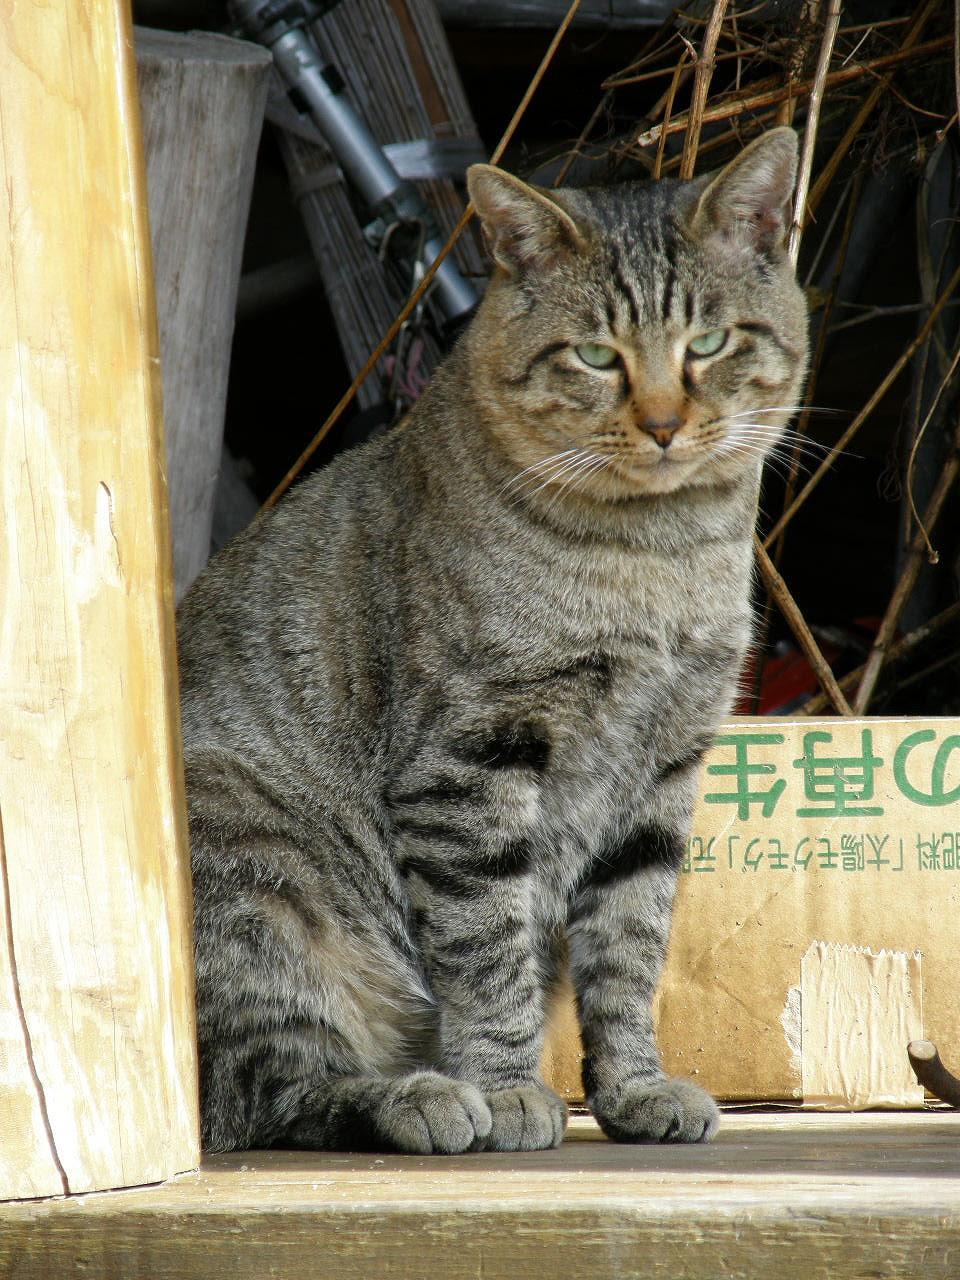 http://upload.wikimedia.org/wikipedia/commons/a/a8/Homeless_cat_%E9%87%8E%E8%89%AF%E7%8C%ABC102574.jpg